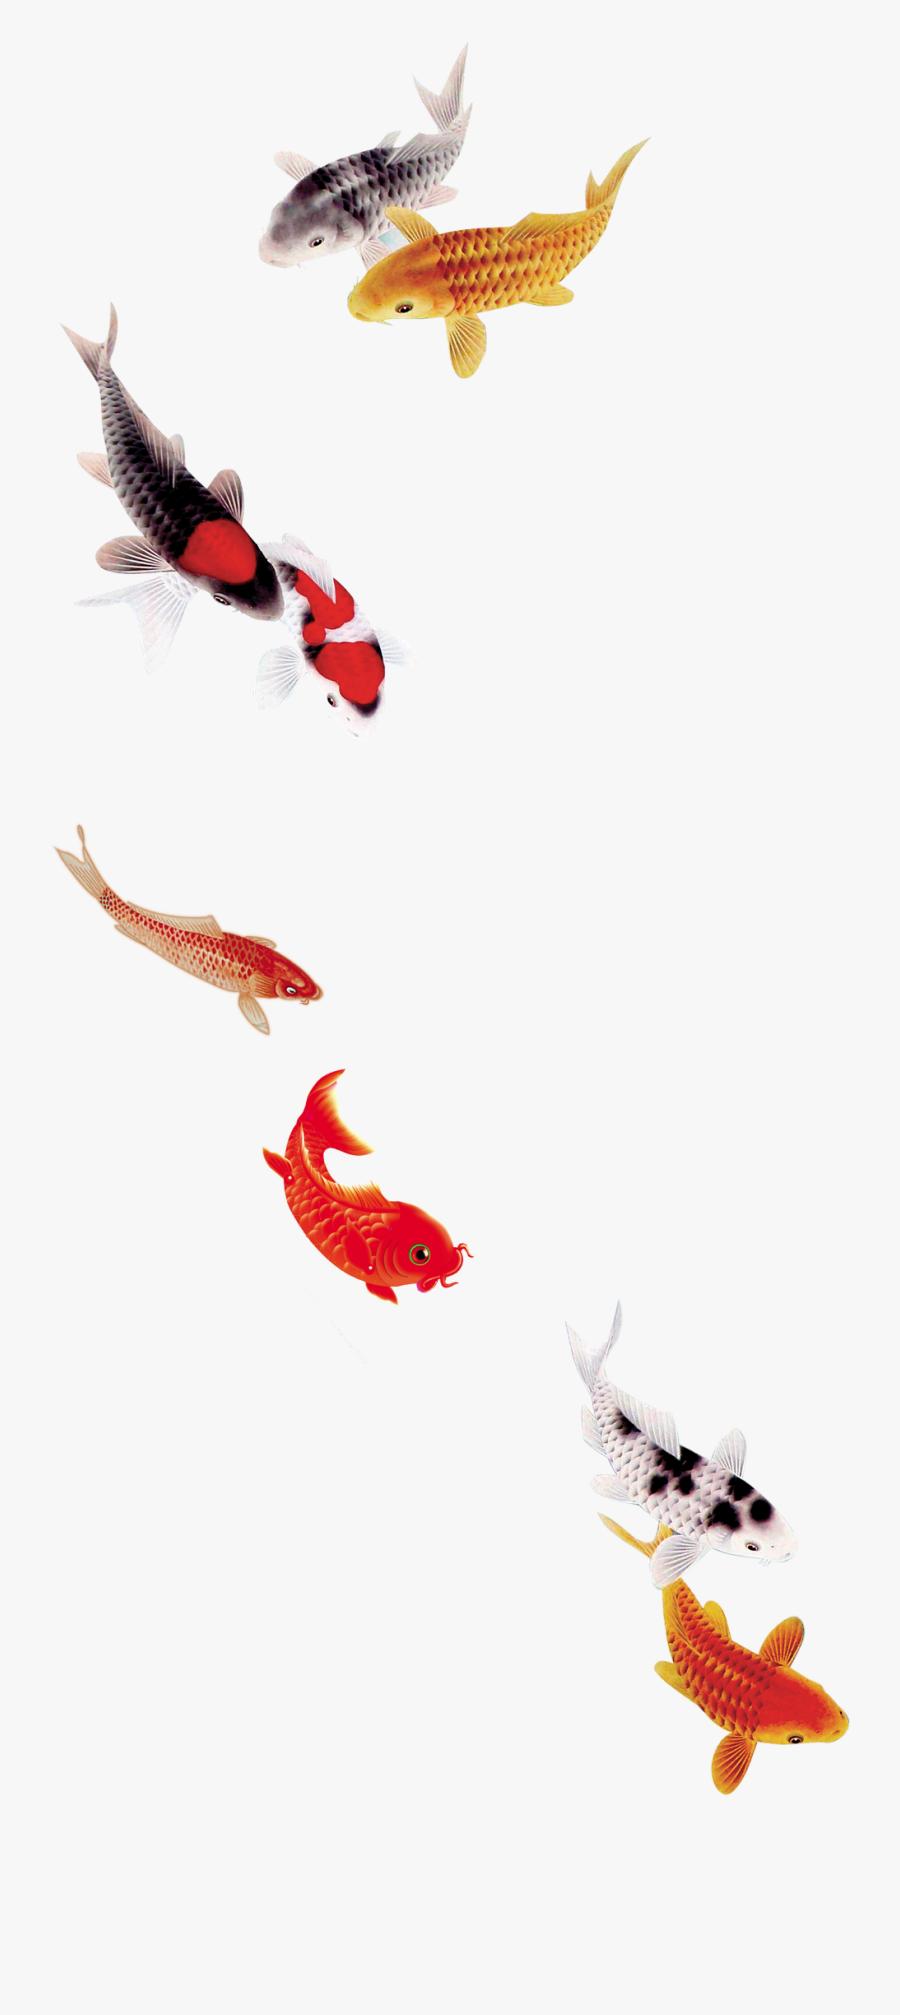 Koi Fish Transparent Koi Fish Png Free Transparent Clipart Clipartkey